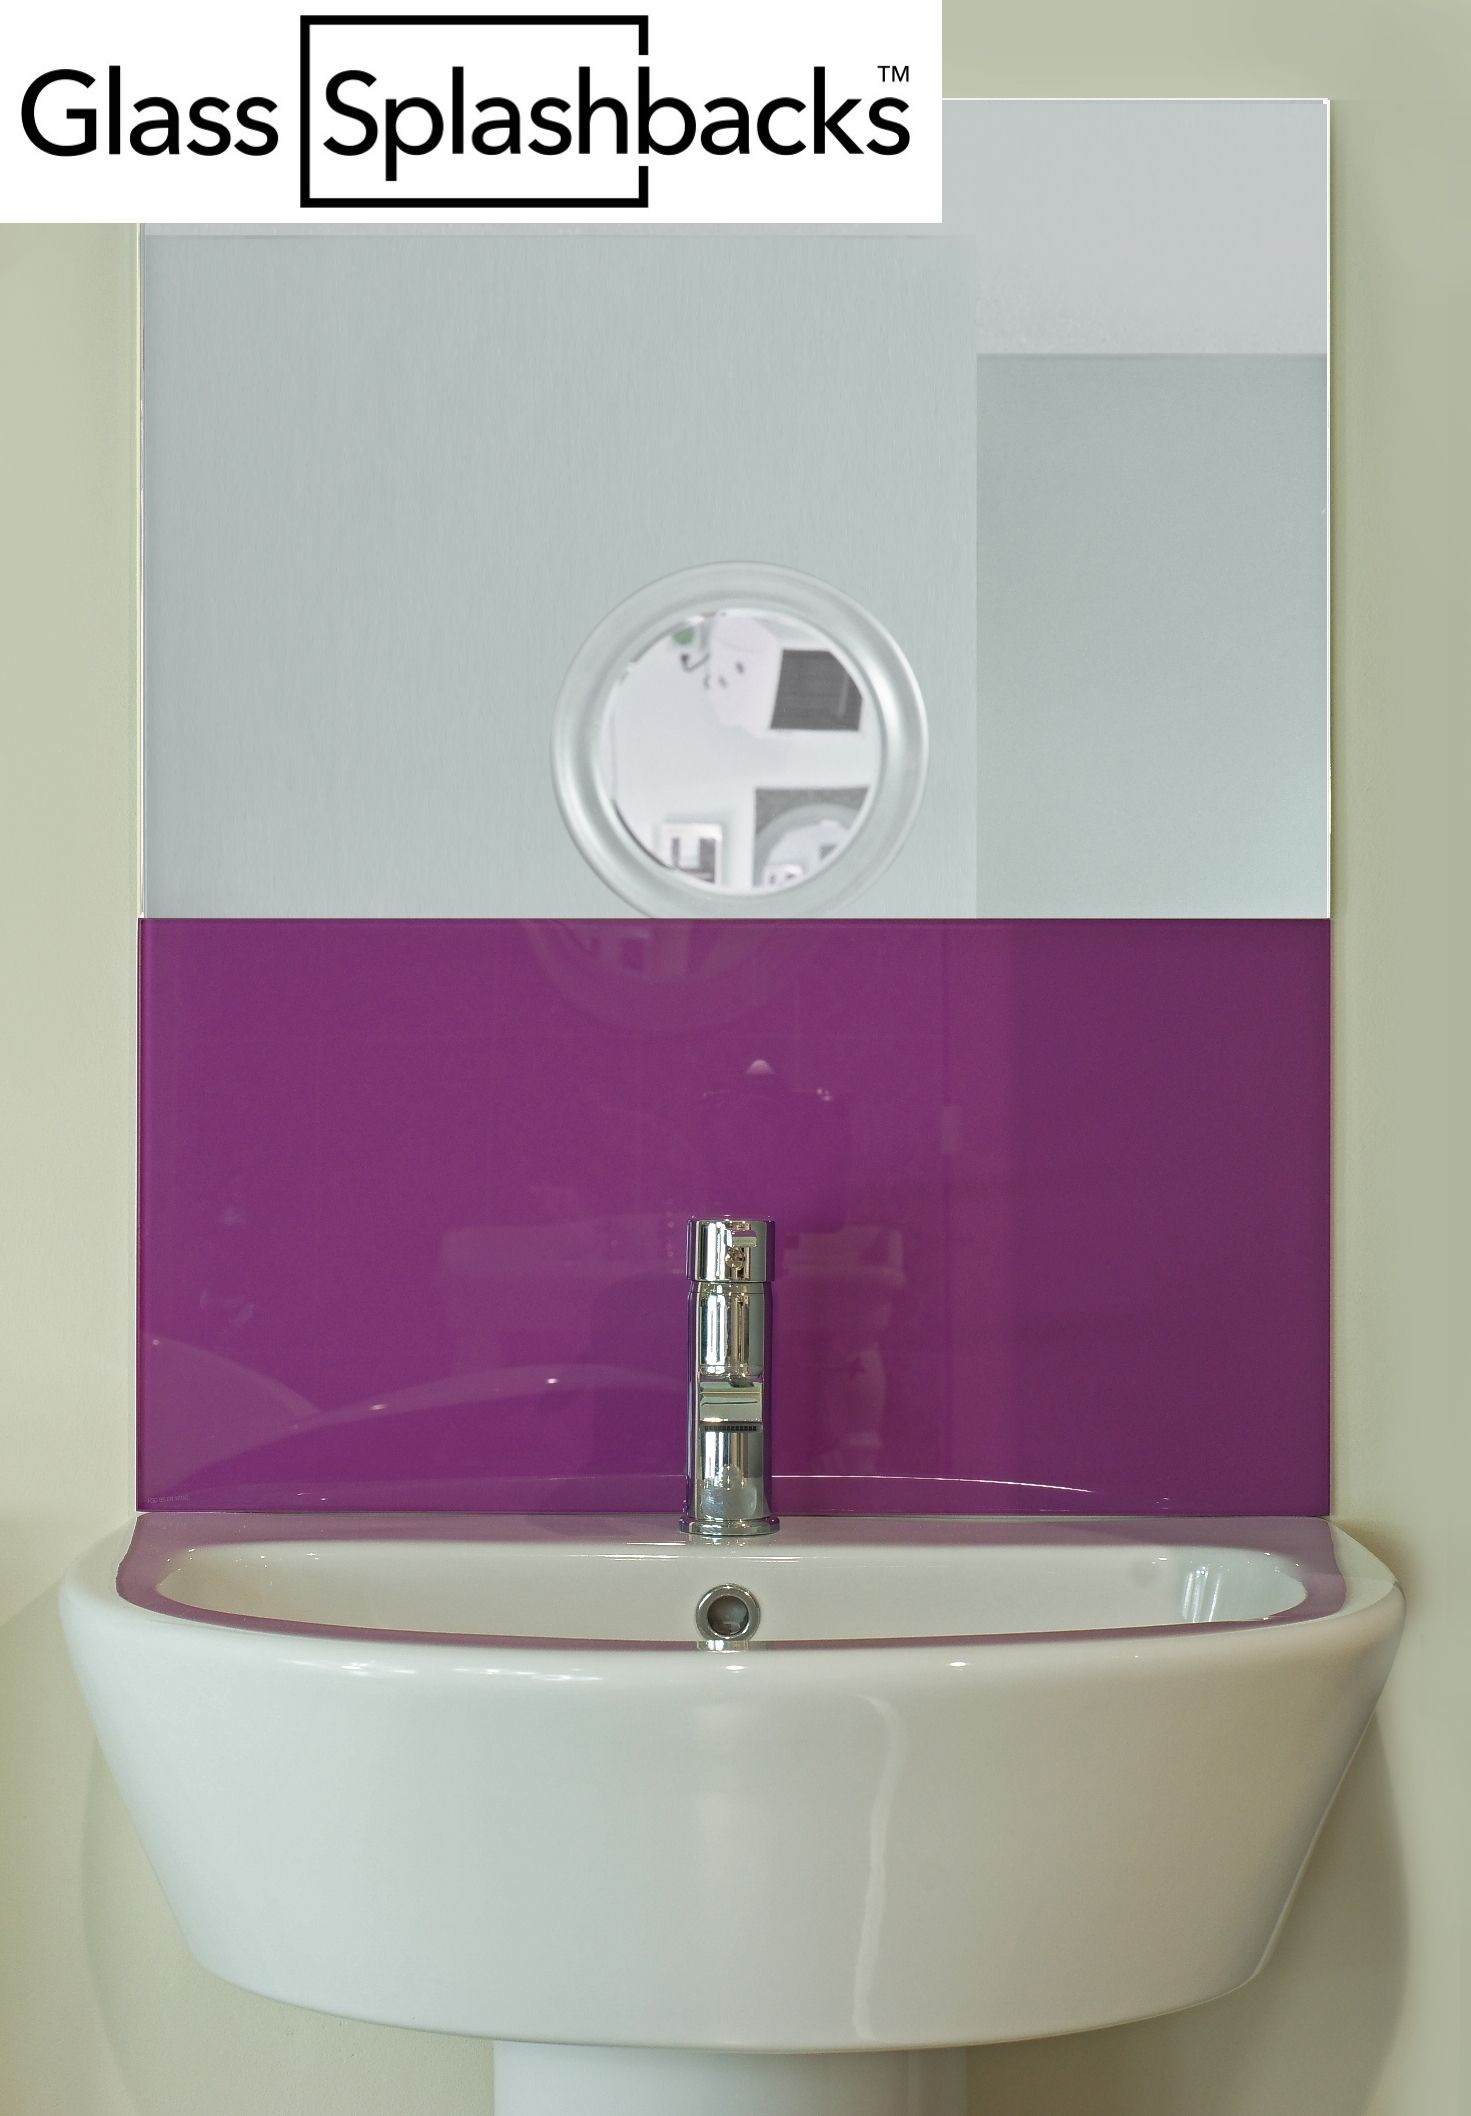 Delicieux Purple Glass Sink Splashback By Glasssplashbacks.com Shop Our Range Of  Standard Sized Sink Splashbacks